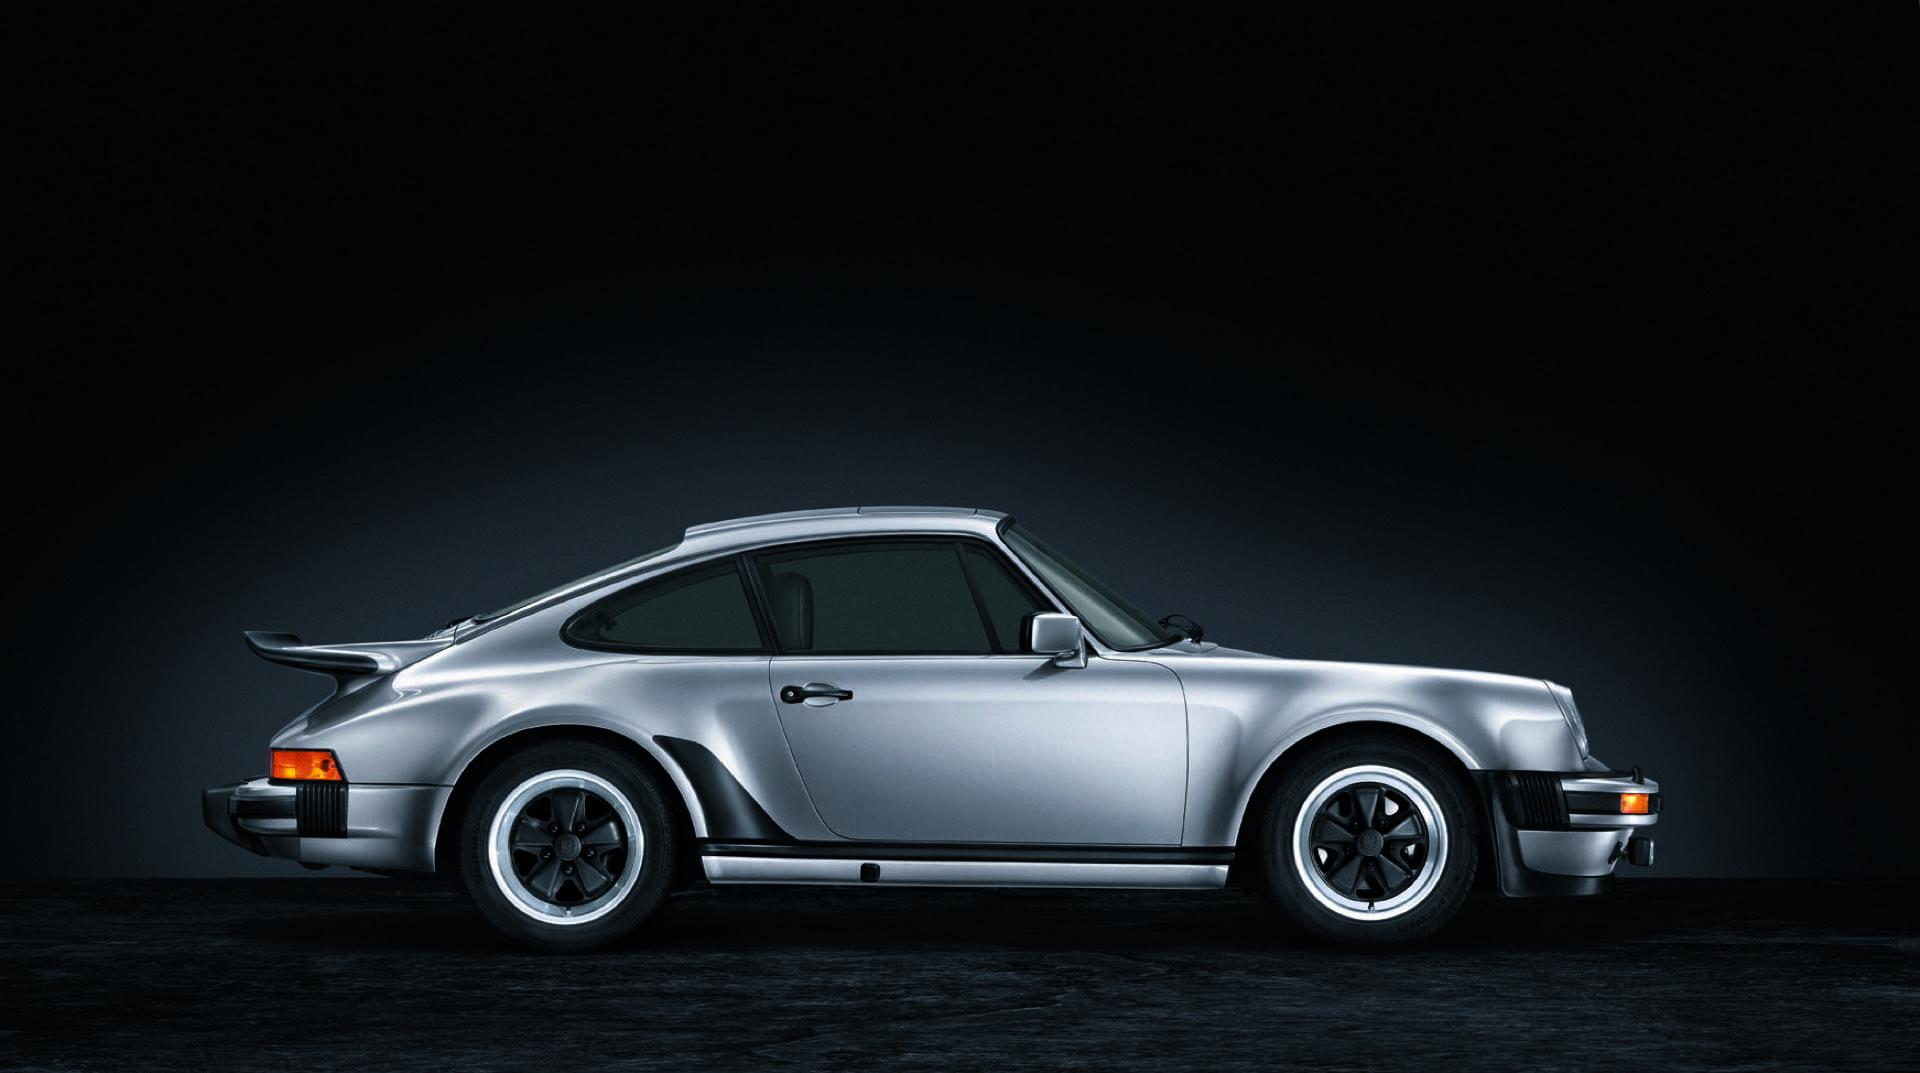 Porsche 911 G Turbo 930 1974